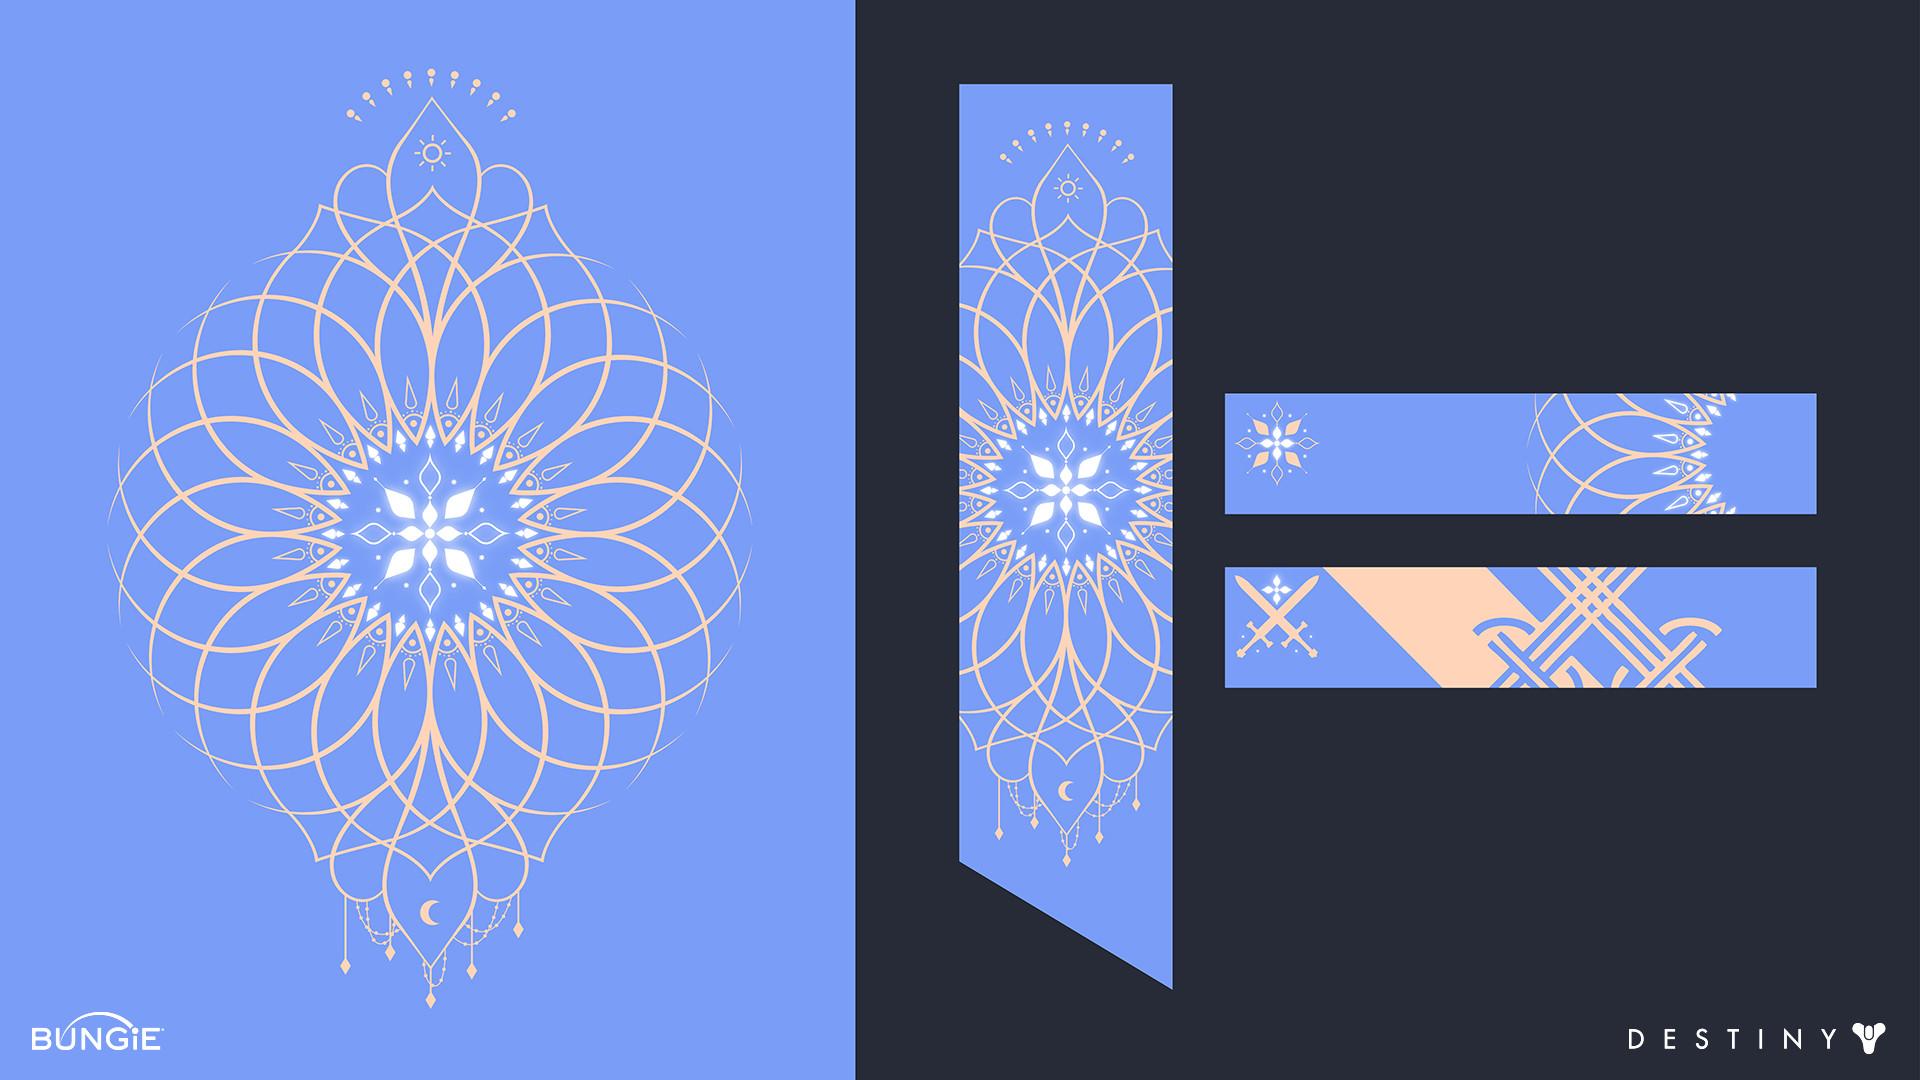 Destiny Concept Art by Dima Goryainov